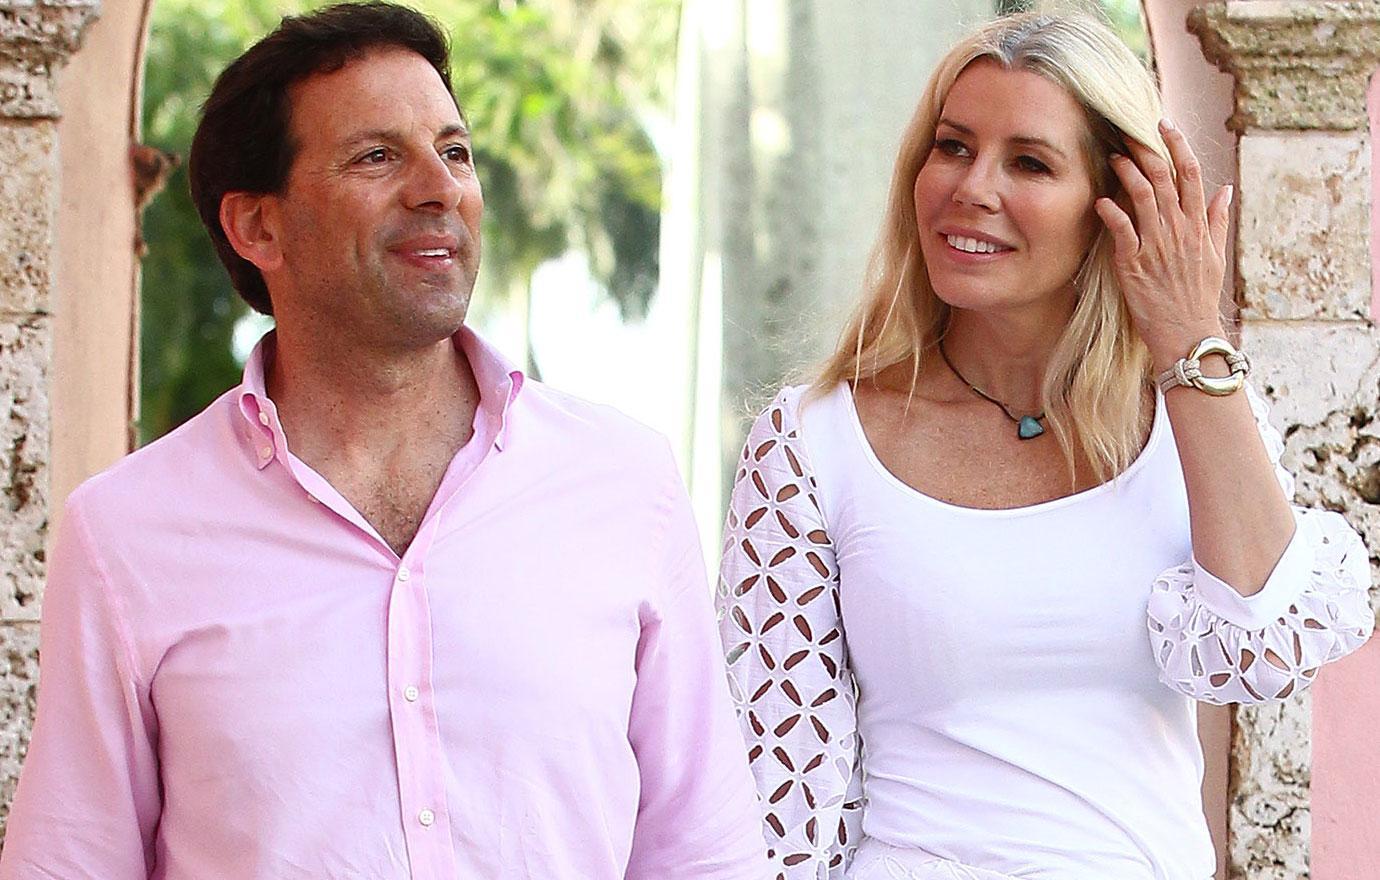 RHONY Aviva Drescher's Husband Legal Trouble Owes Money